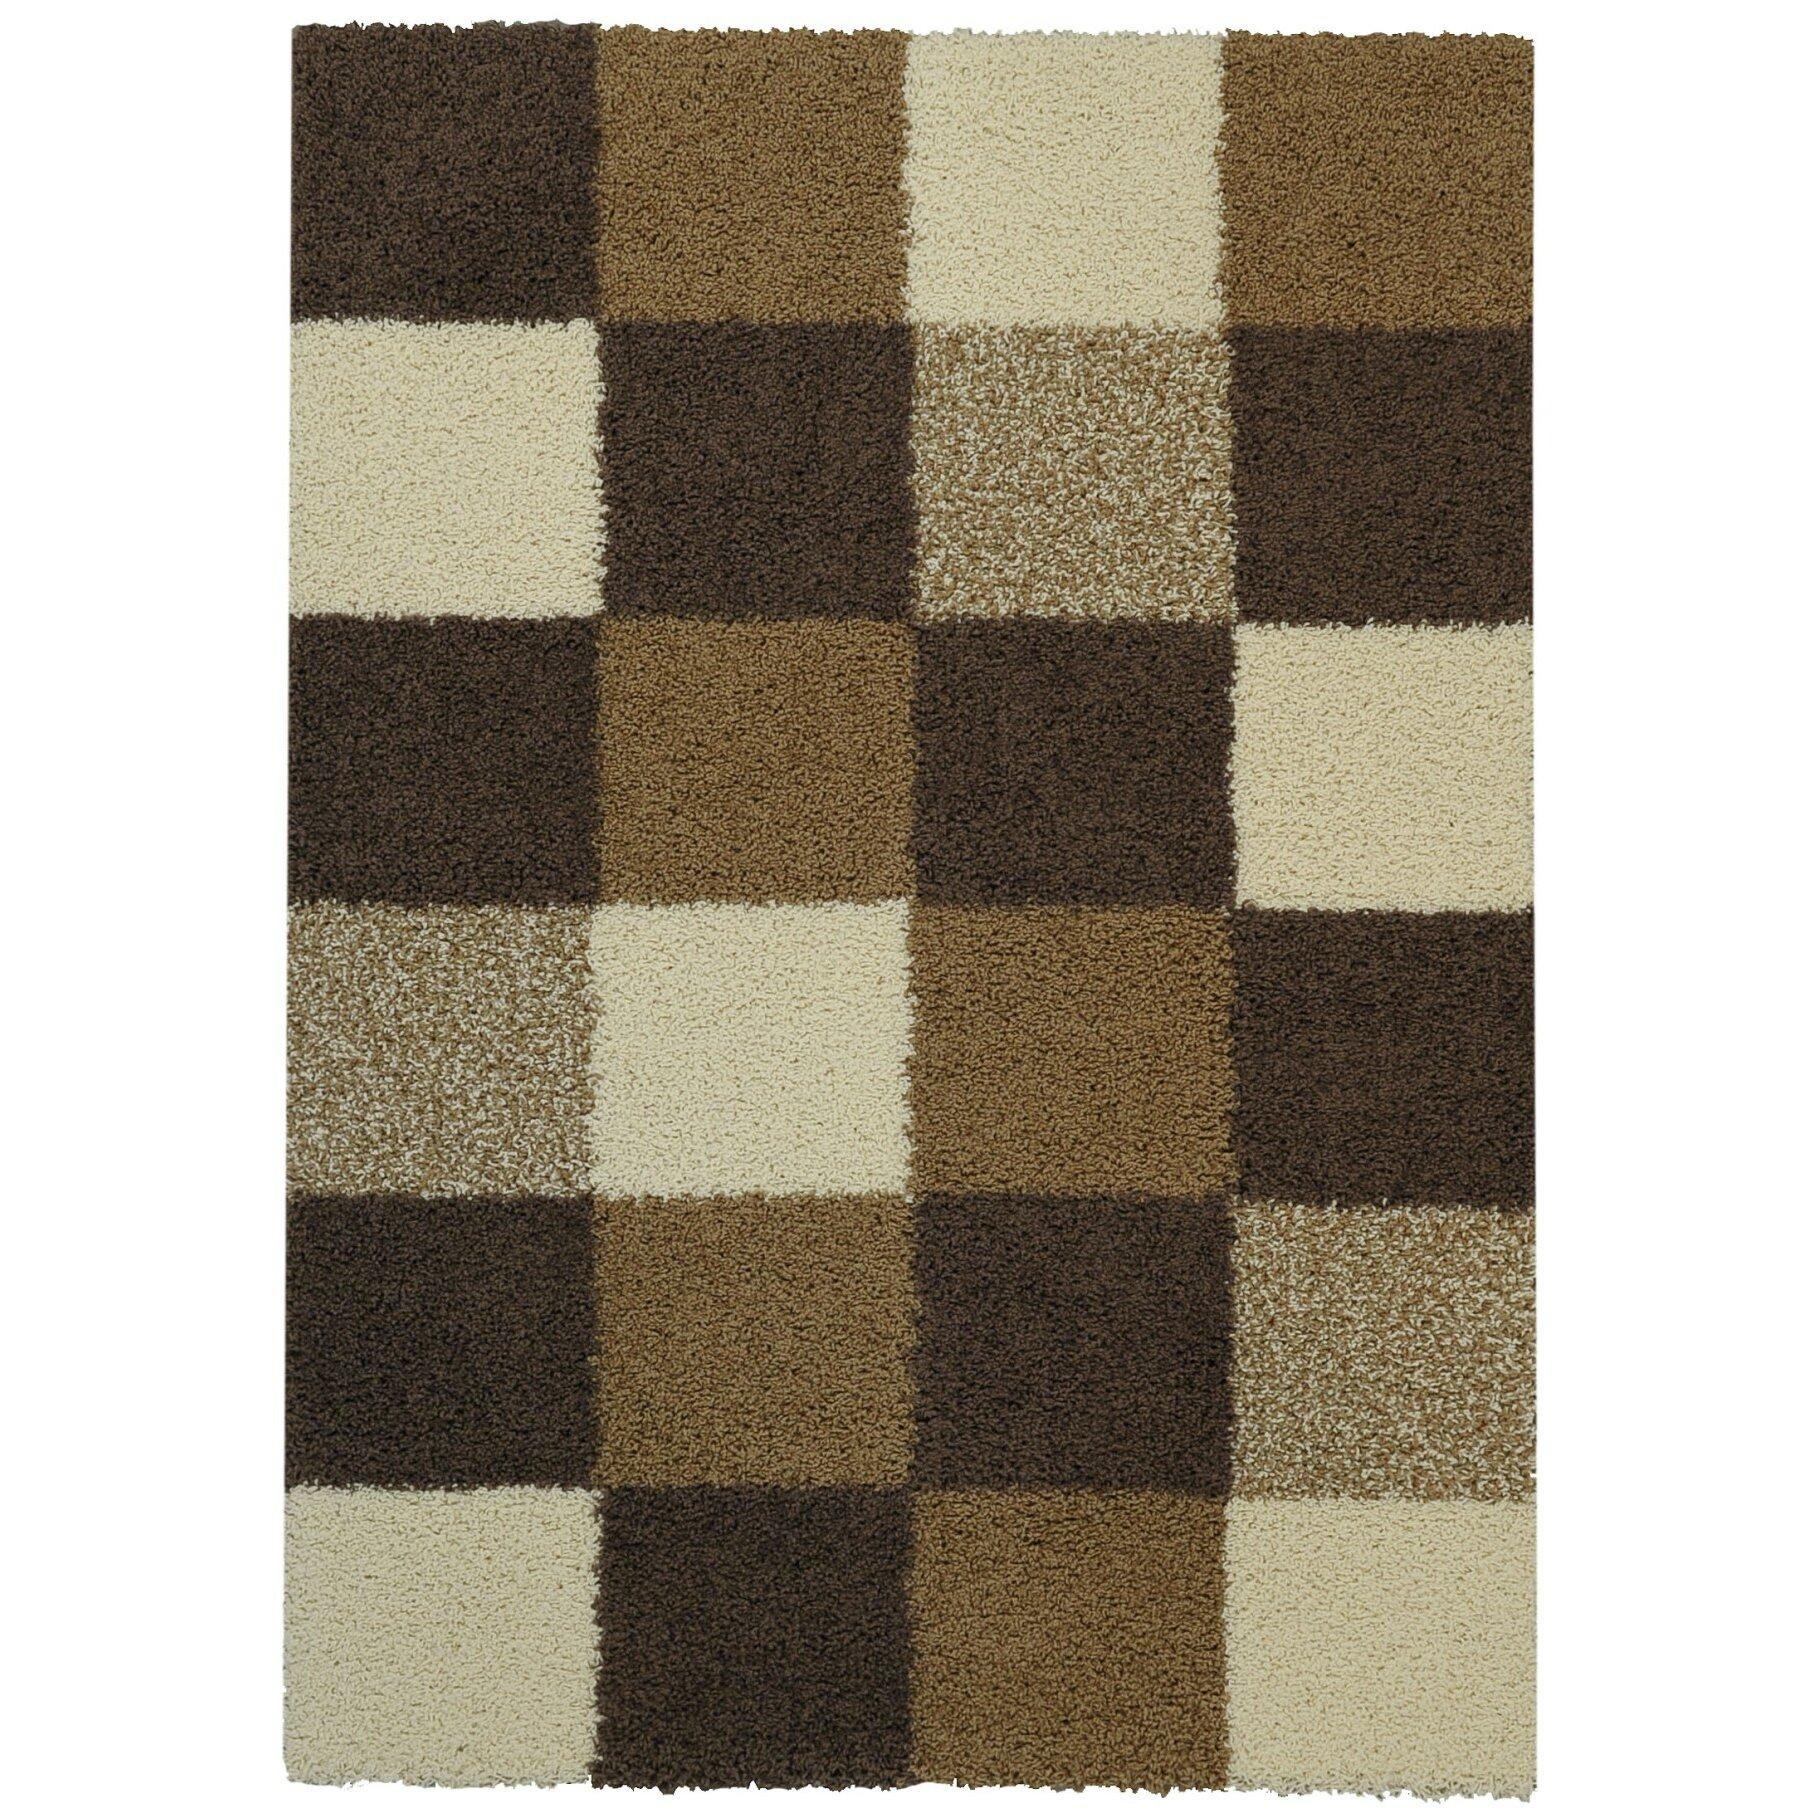 Rugnur bella maxy home checkerboard squares contemporary ivory brown shag area rug reviews - Checkerboard area rug ...